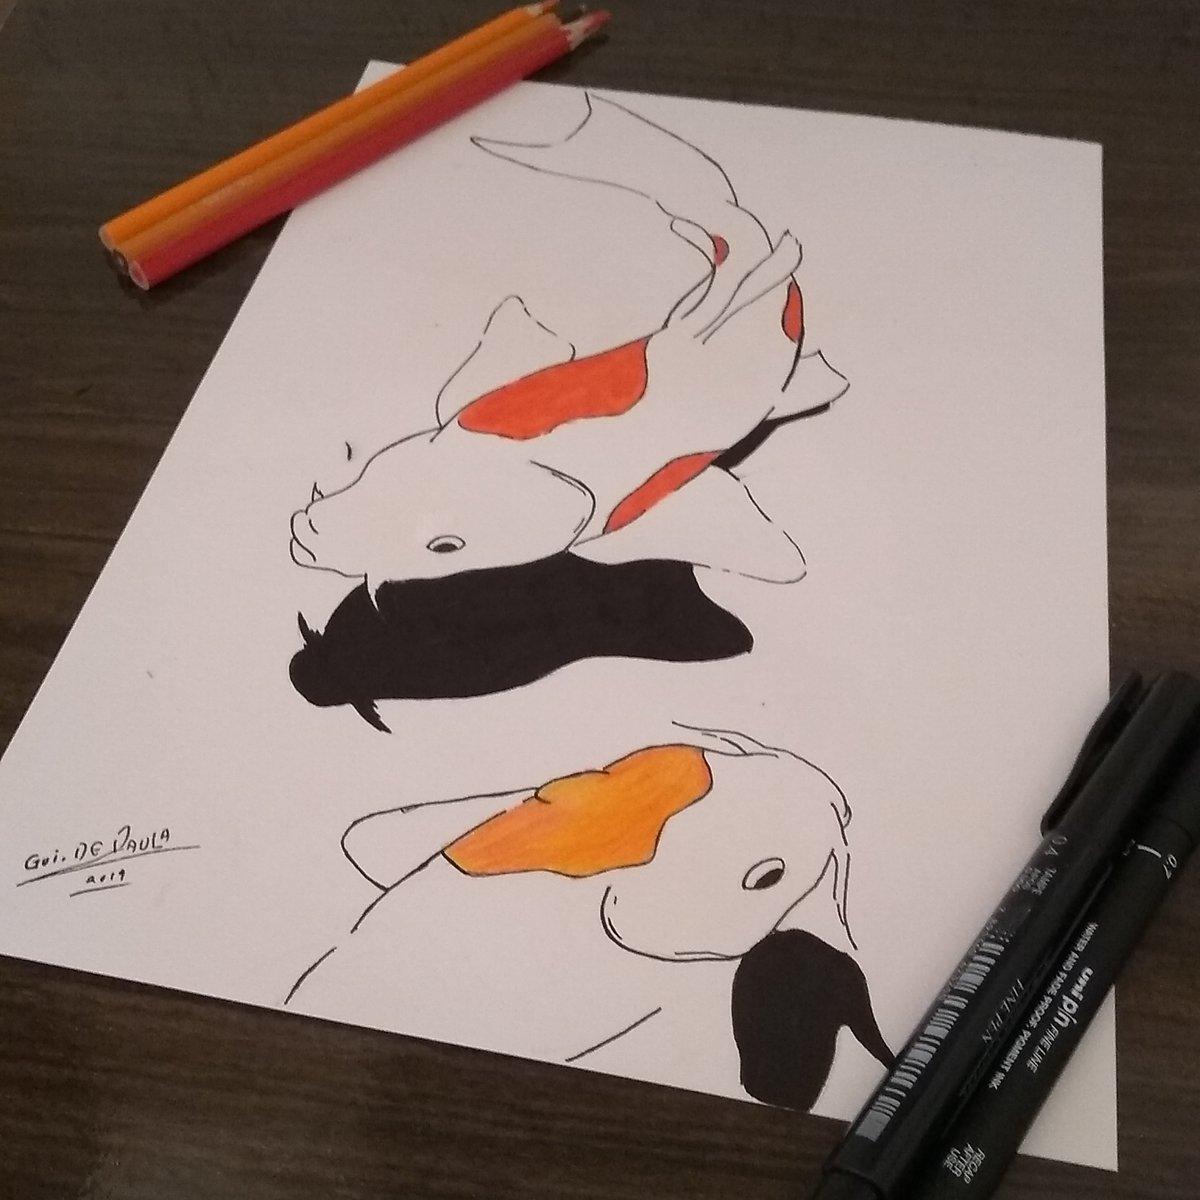 Peixe  #desenhocolorido #desenho #desenhodeumanimal #artfinalpic.twitter.com/5r7YxfaFMn